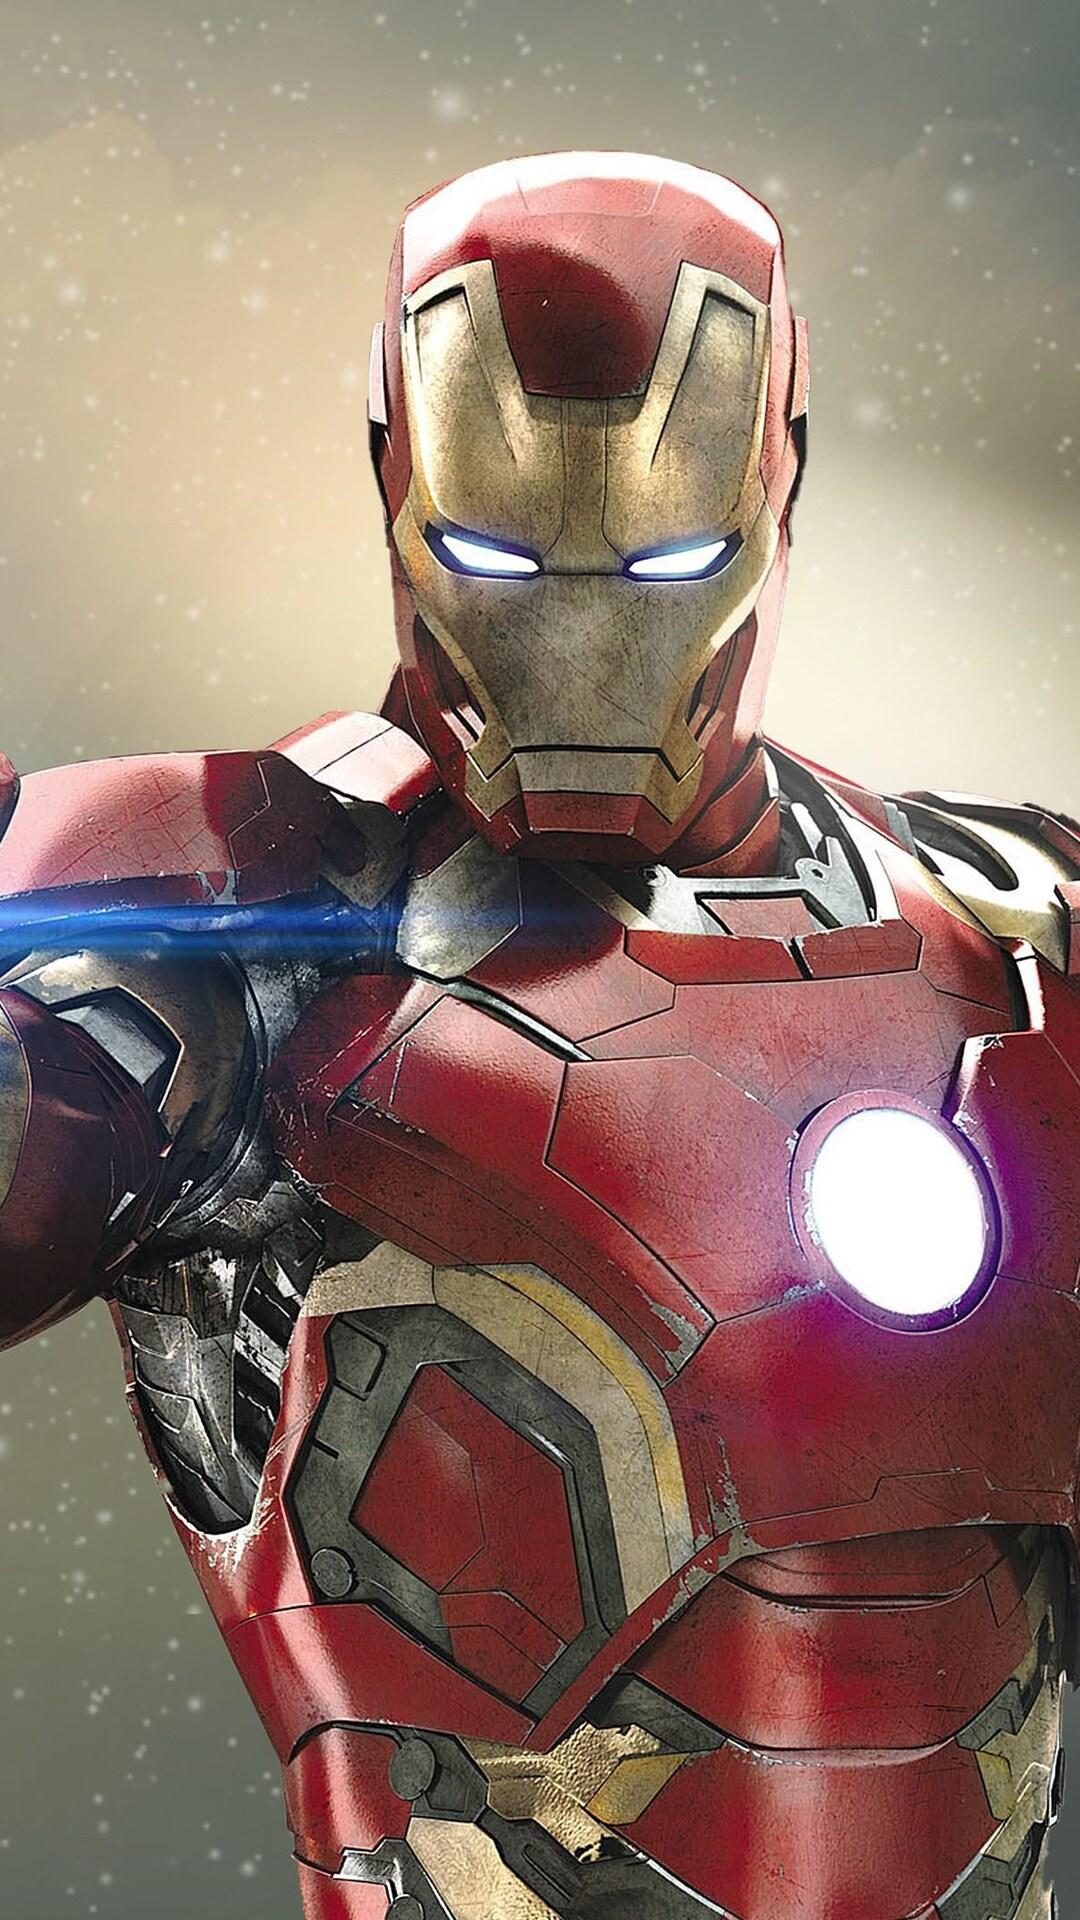 1080x1920 Iron Man 4k Iphone 7,6s,6 Plus, Pixel xl ,One ...